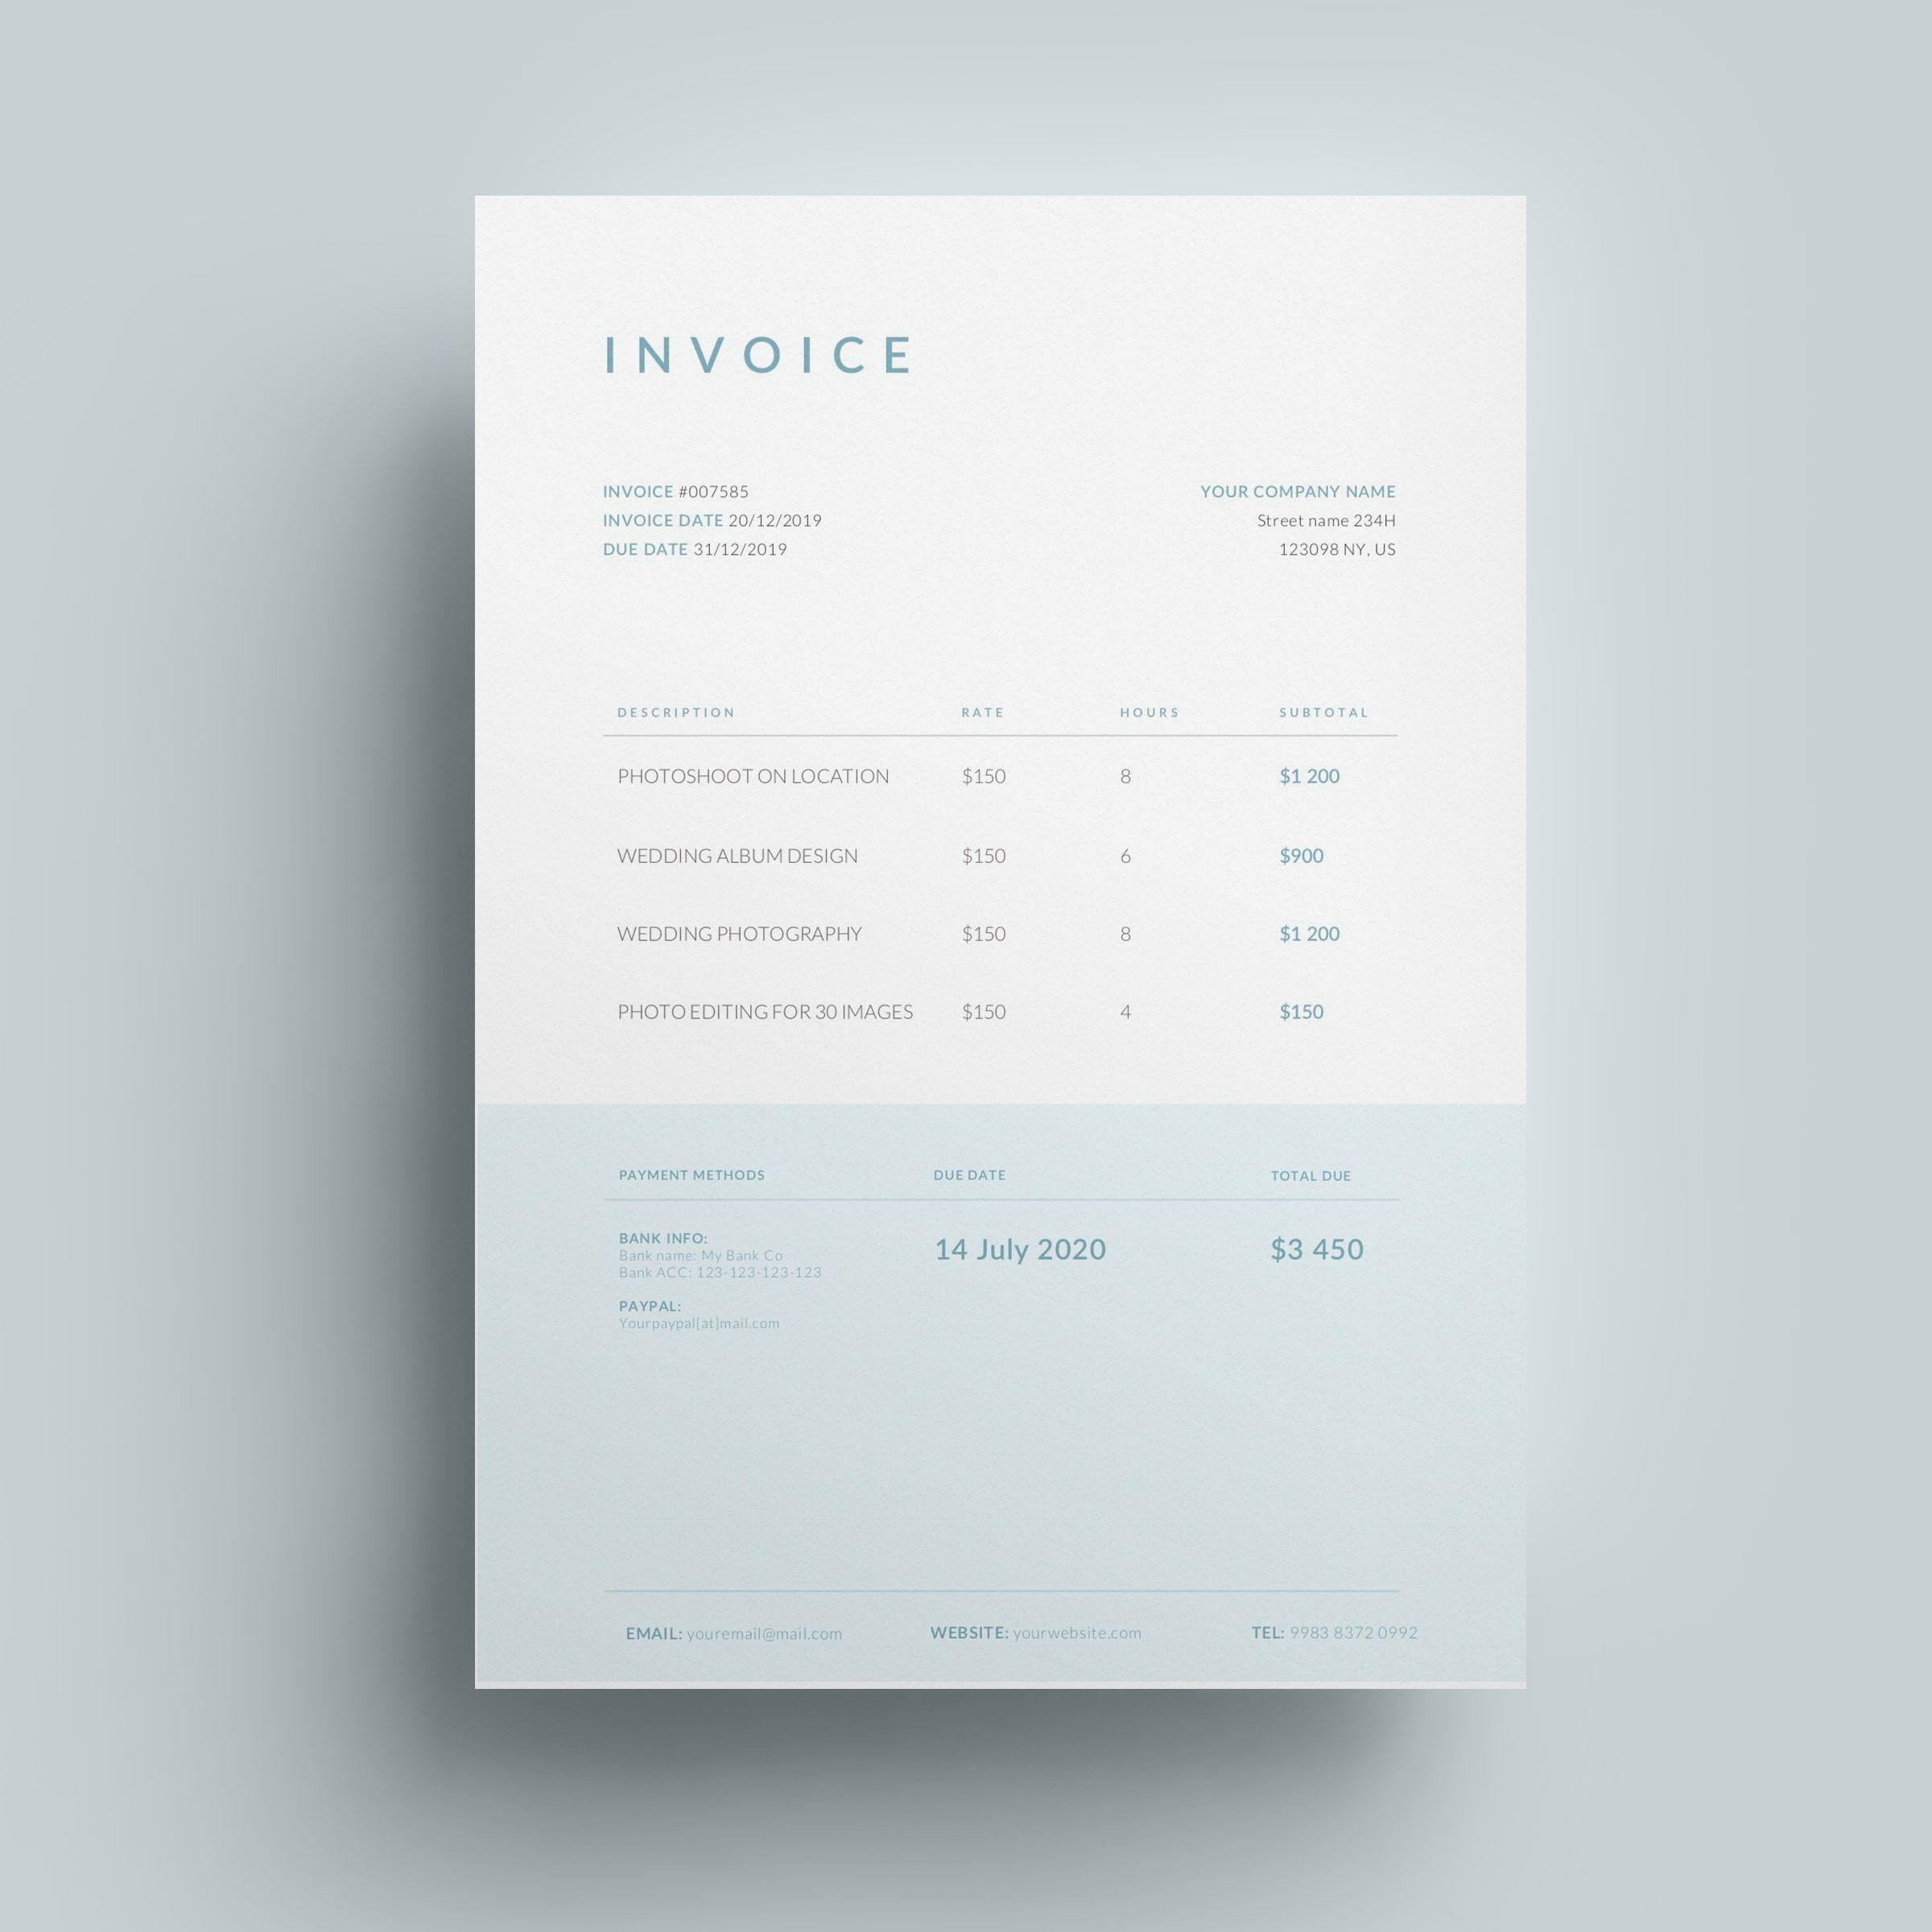 Invoice Template, Business Invoice, Receipt Template, Photography Invoice Template, Printable Invoice, Invoice Design Form Printable Receipt